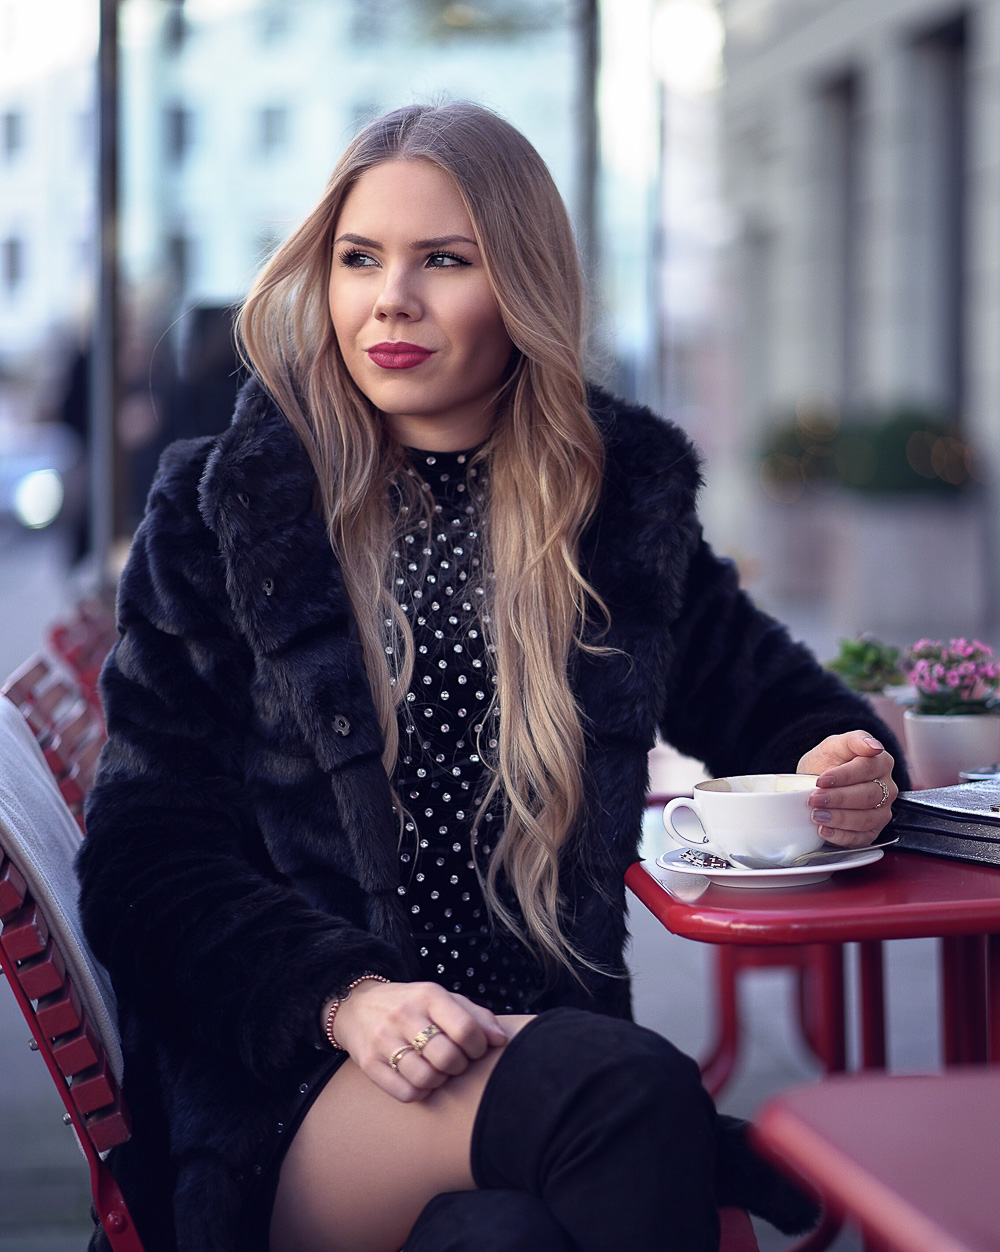 Modeblog-Overknee-Stiefel-Strumpfhose-Kleid-Fake-Fur-Mantel